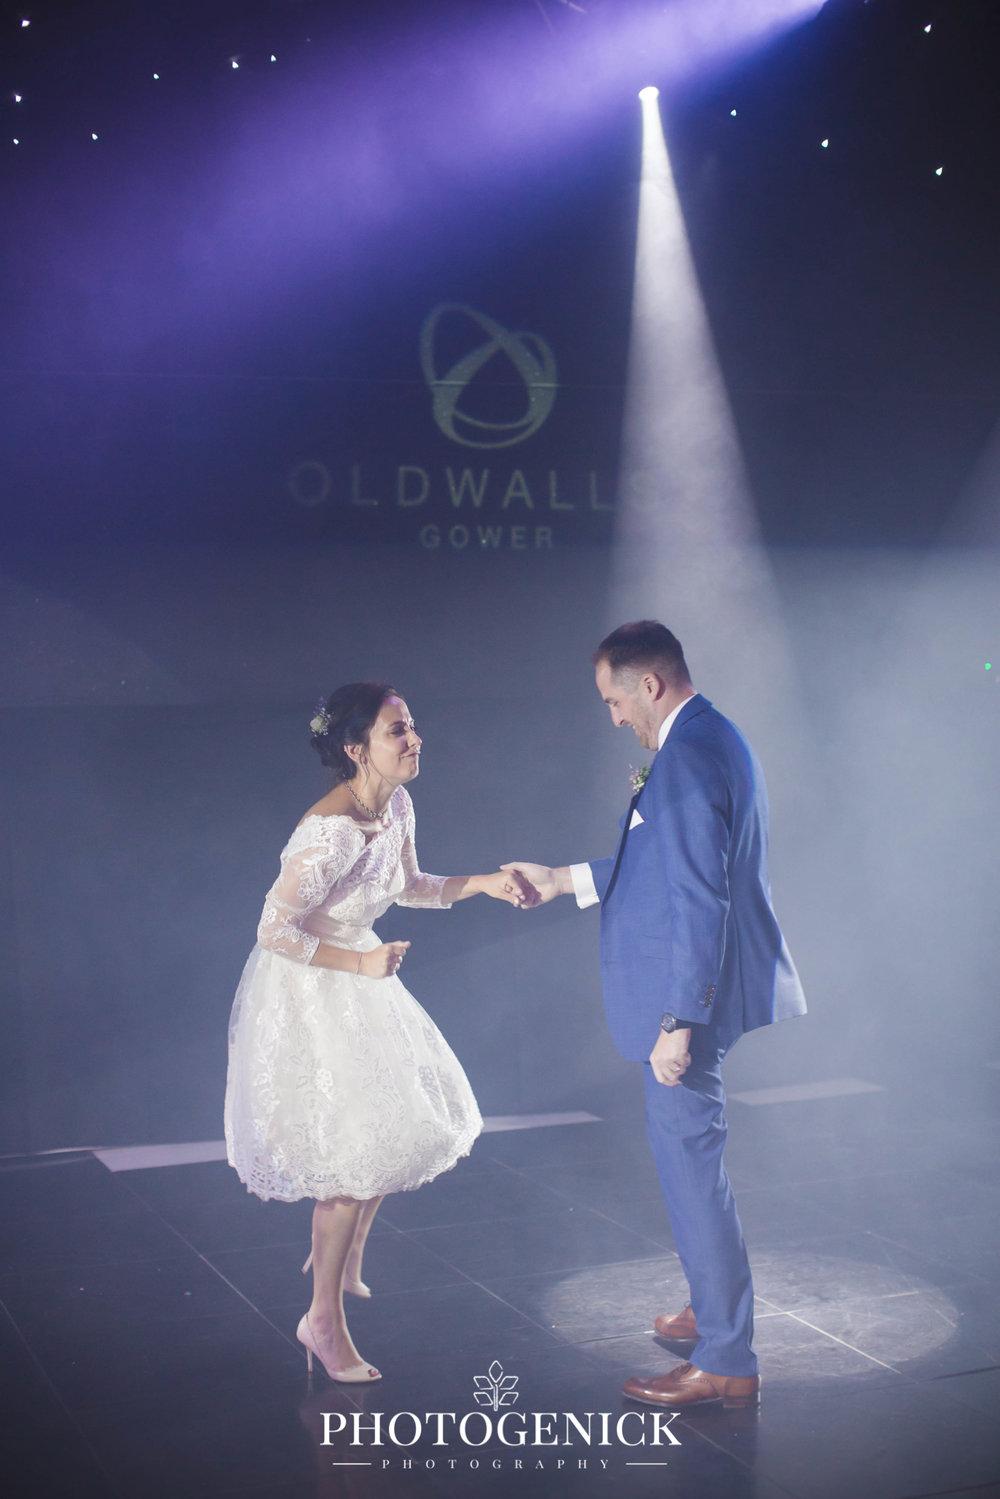 oldwalls gower wedding photographers-67.jpg